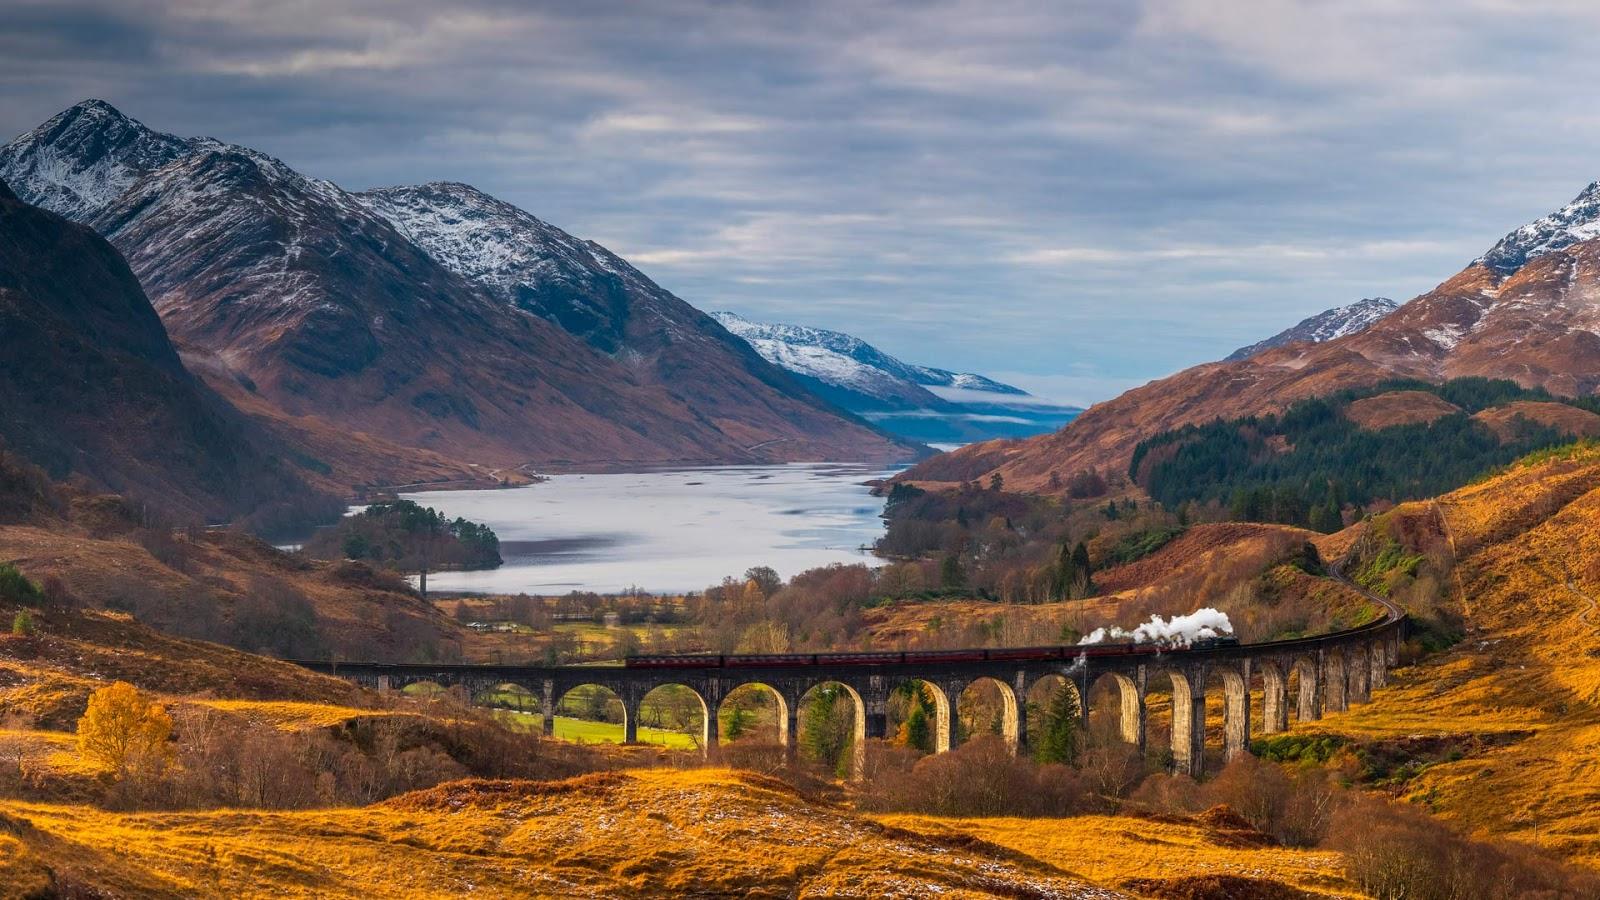 The Glenfinnan Viaduct in Scotland © Jon Arnold/DanitaDelimont.com